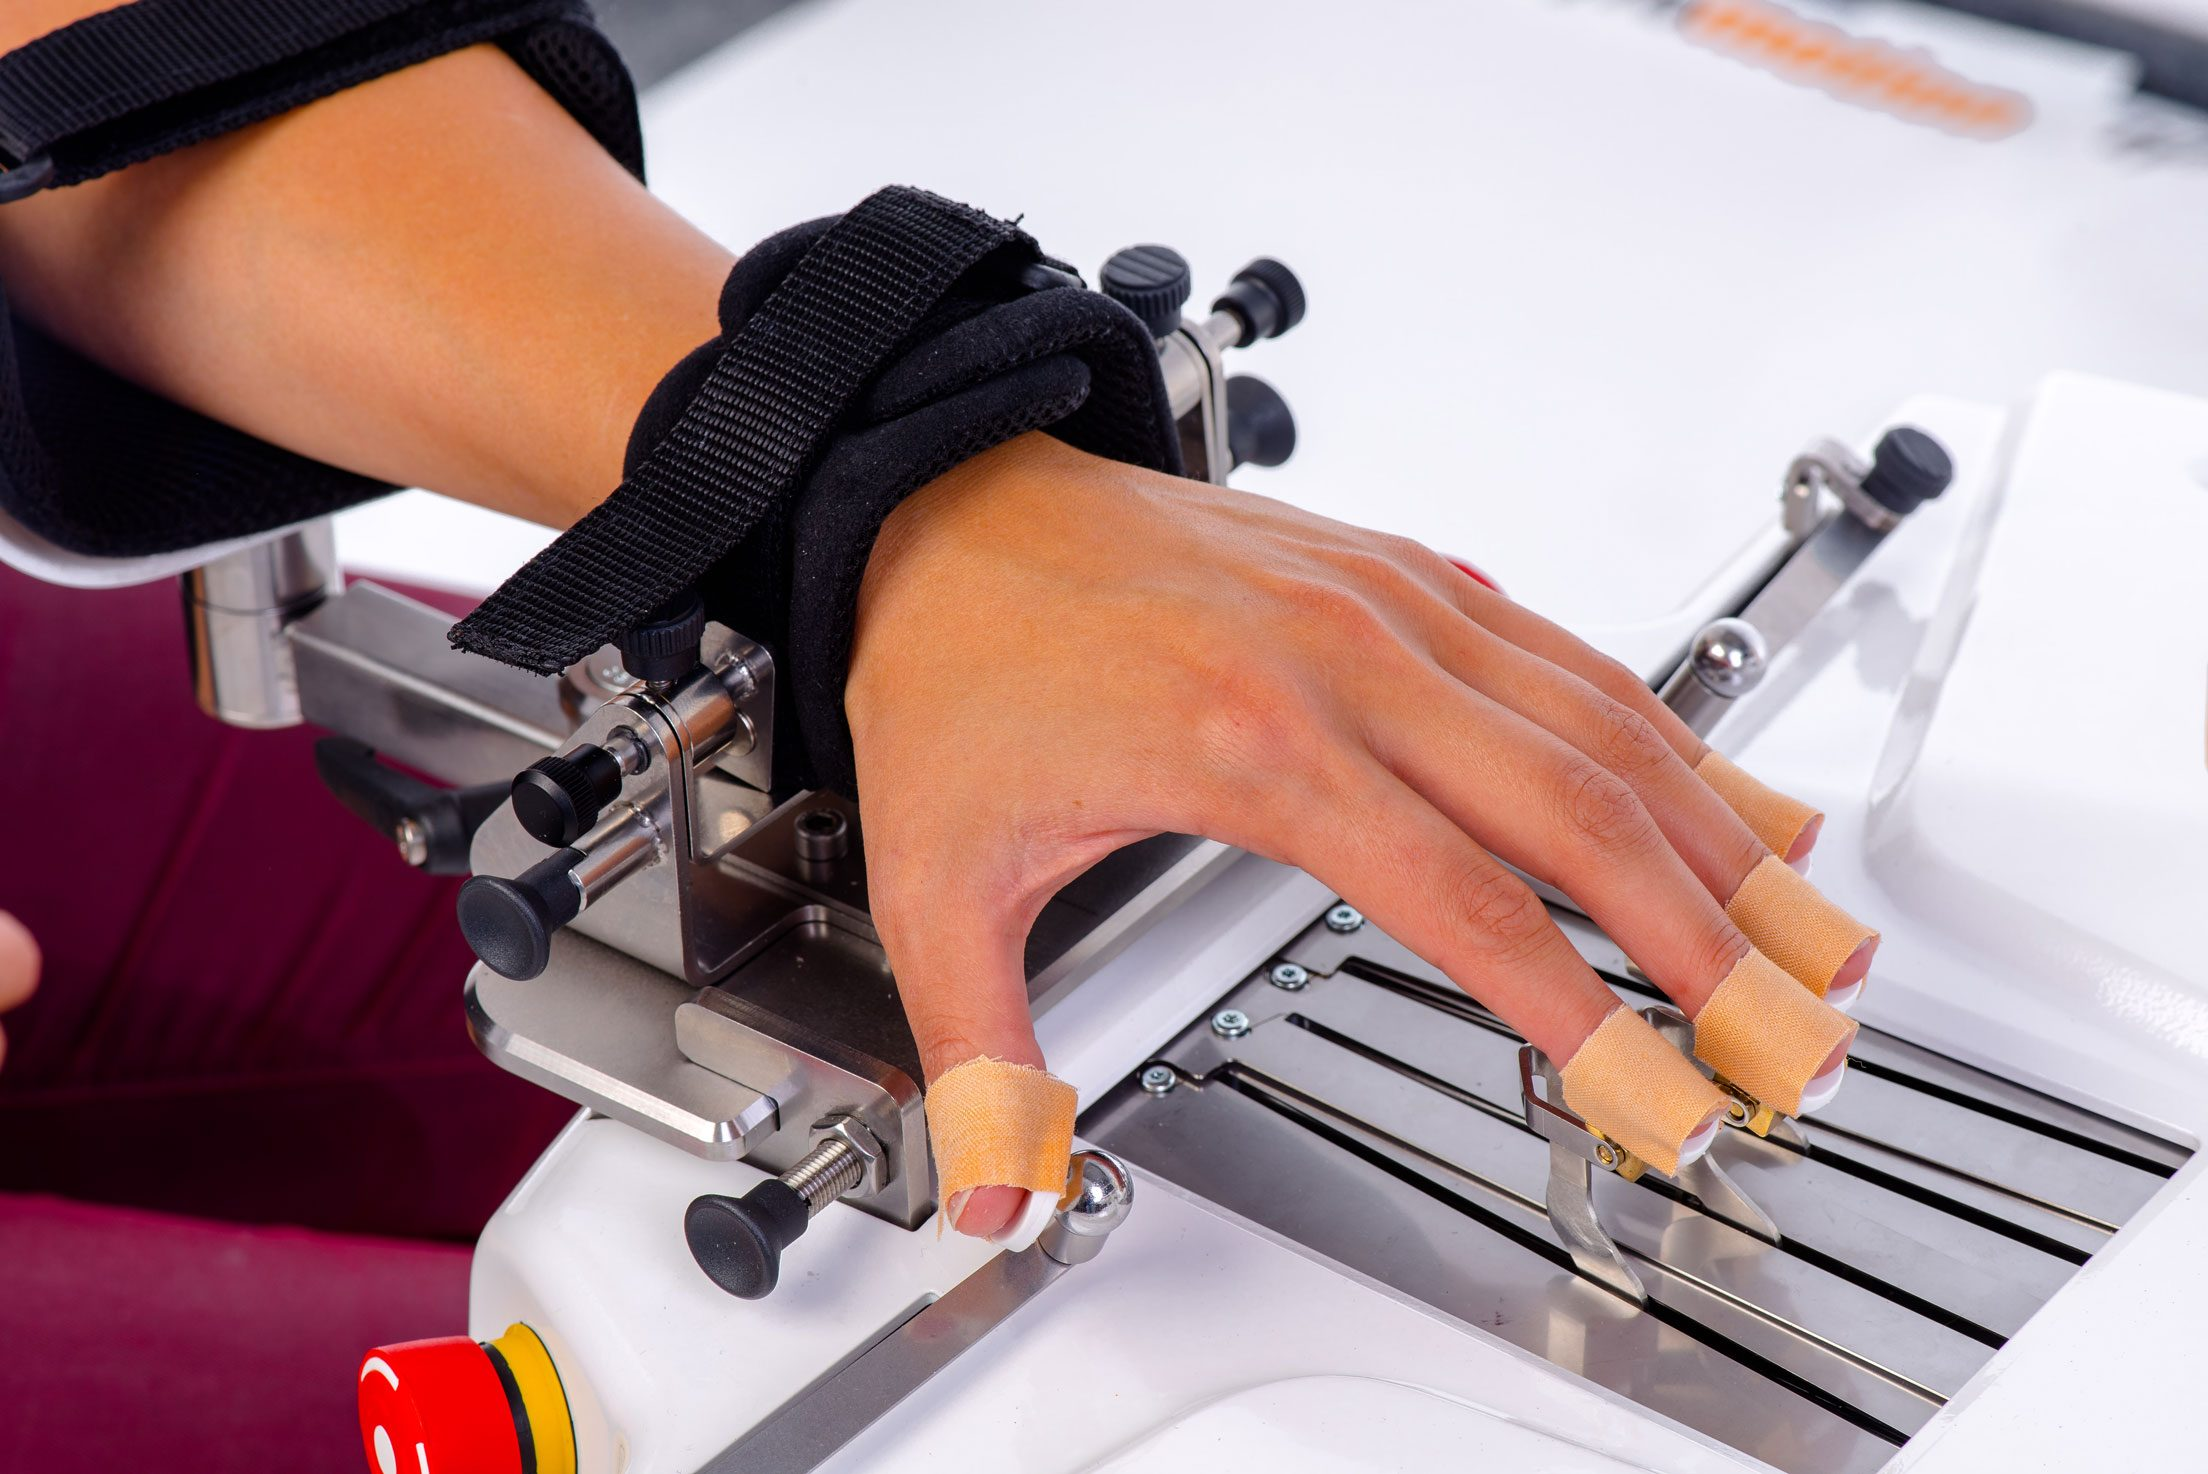 Robot manos Amadeo